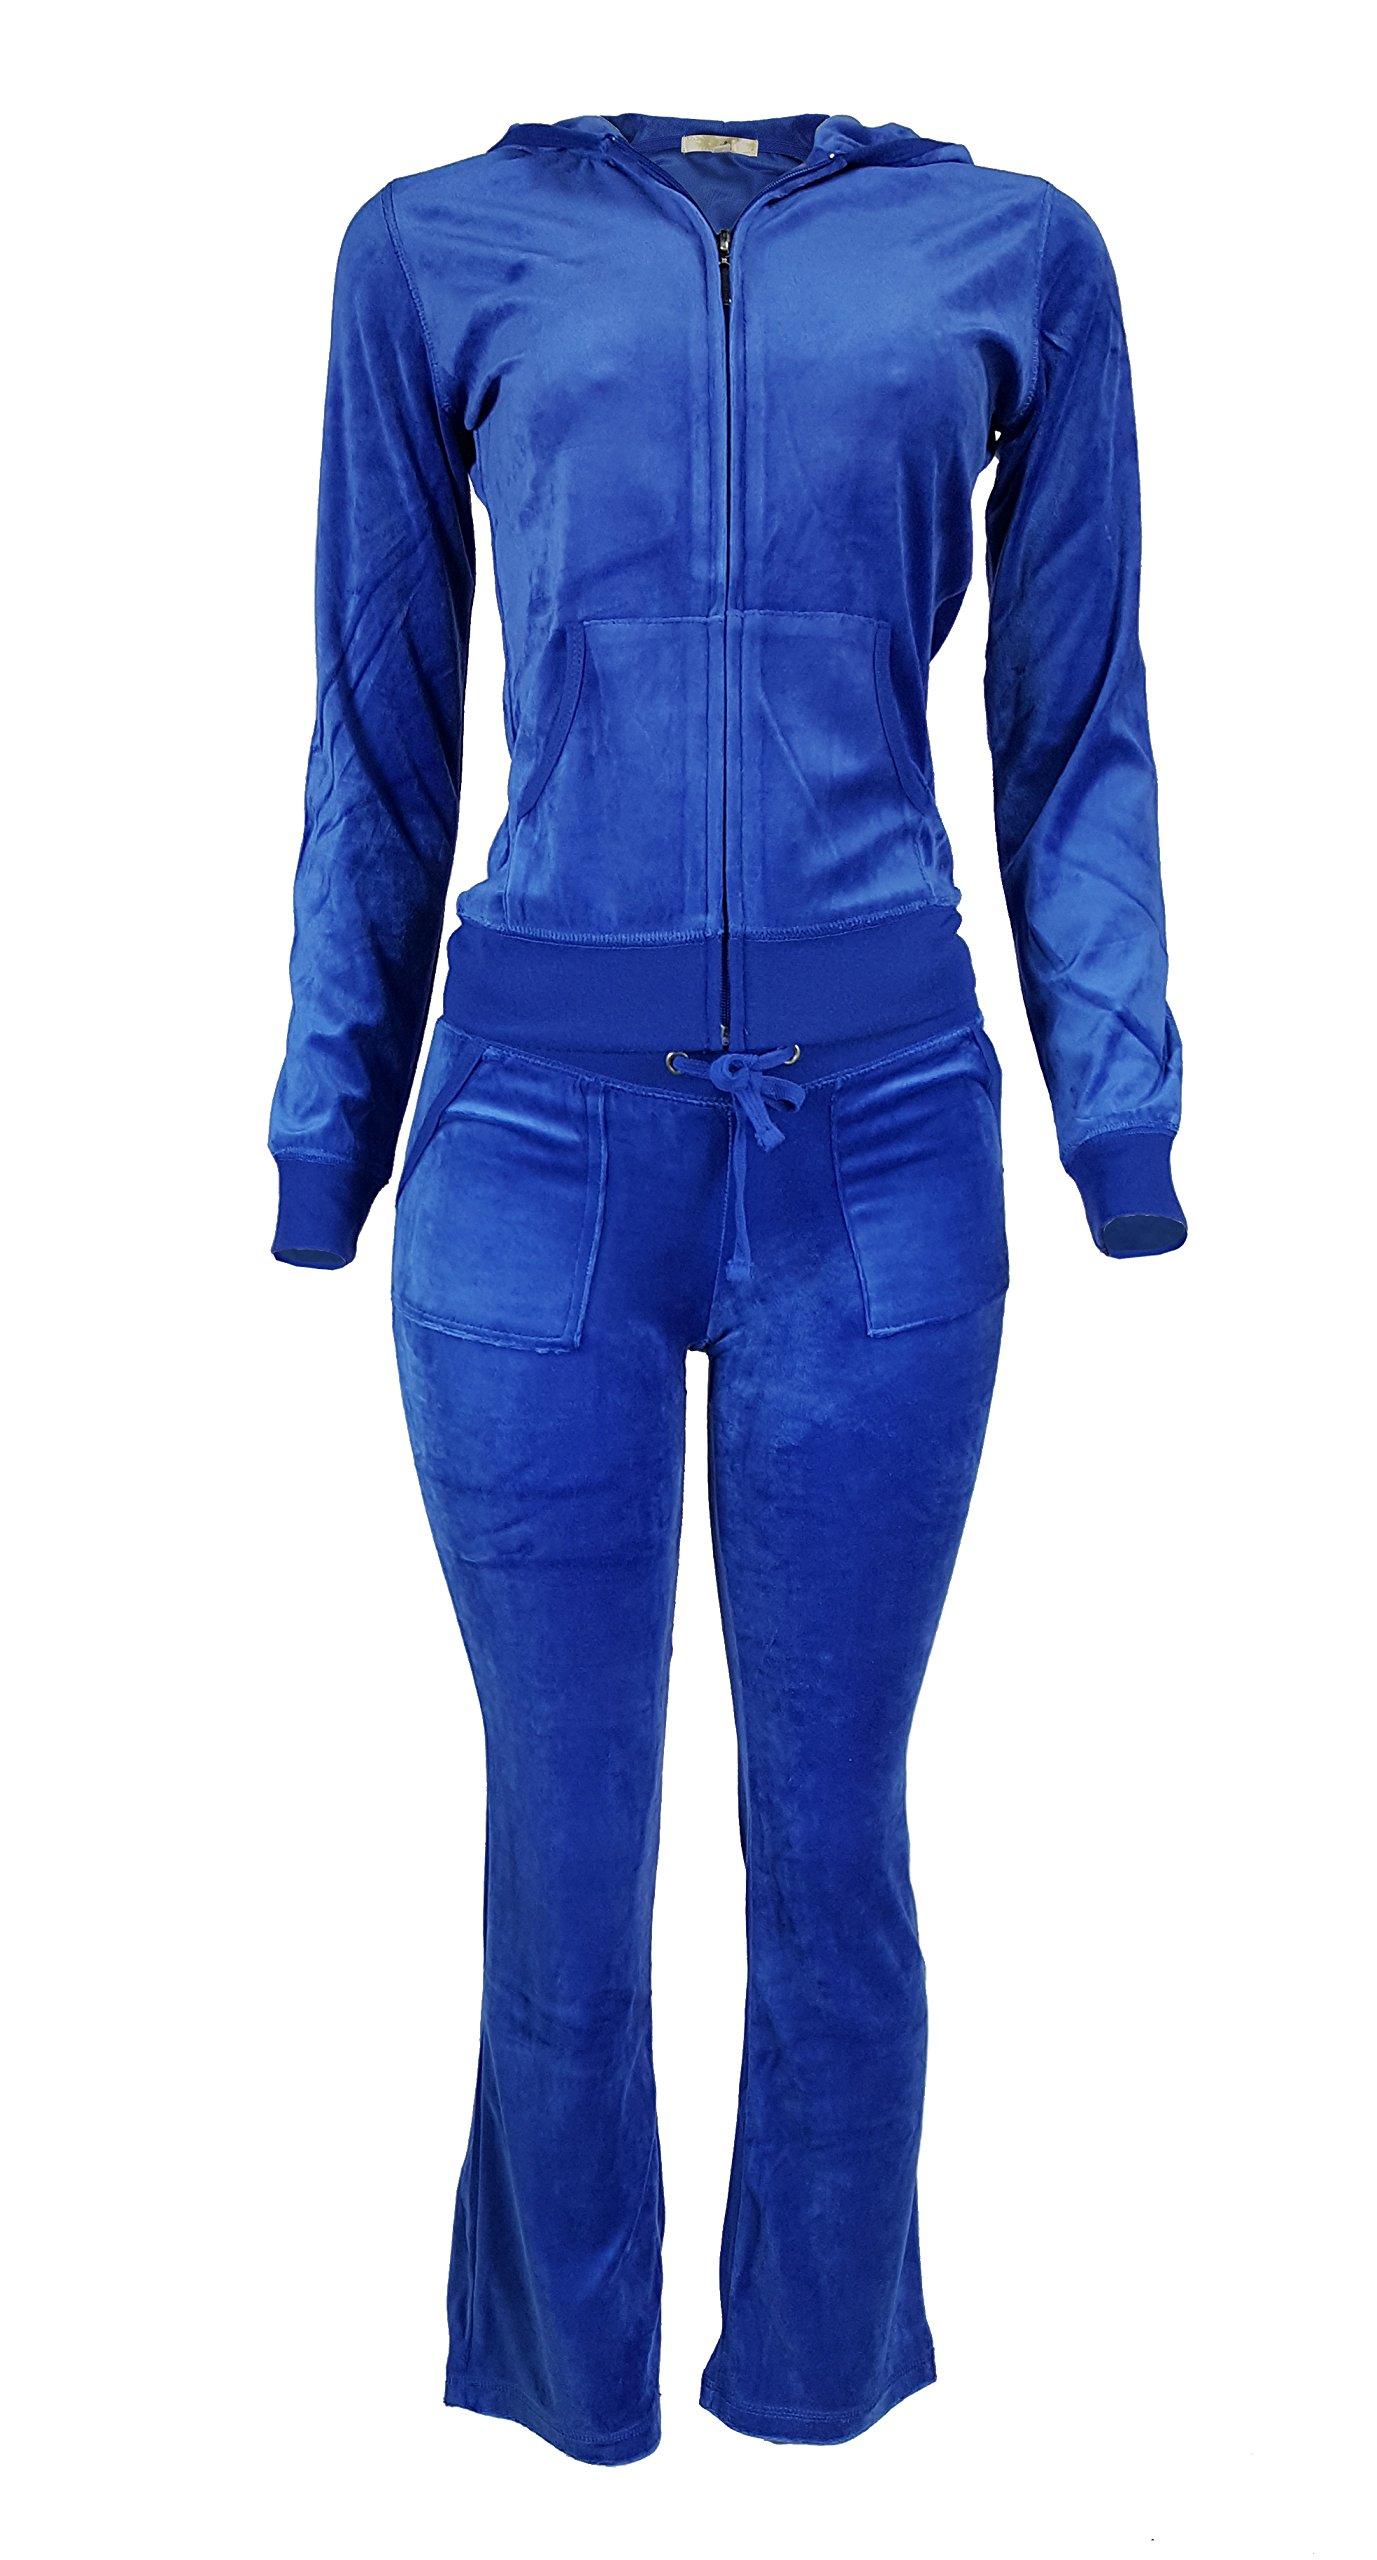 Women's Lightweight Hoodie & Sweatpants Velour Suit 2 Piece Loungewear Set (S-3XL) XX-Large Royal Blue